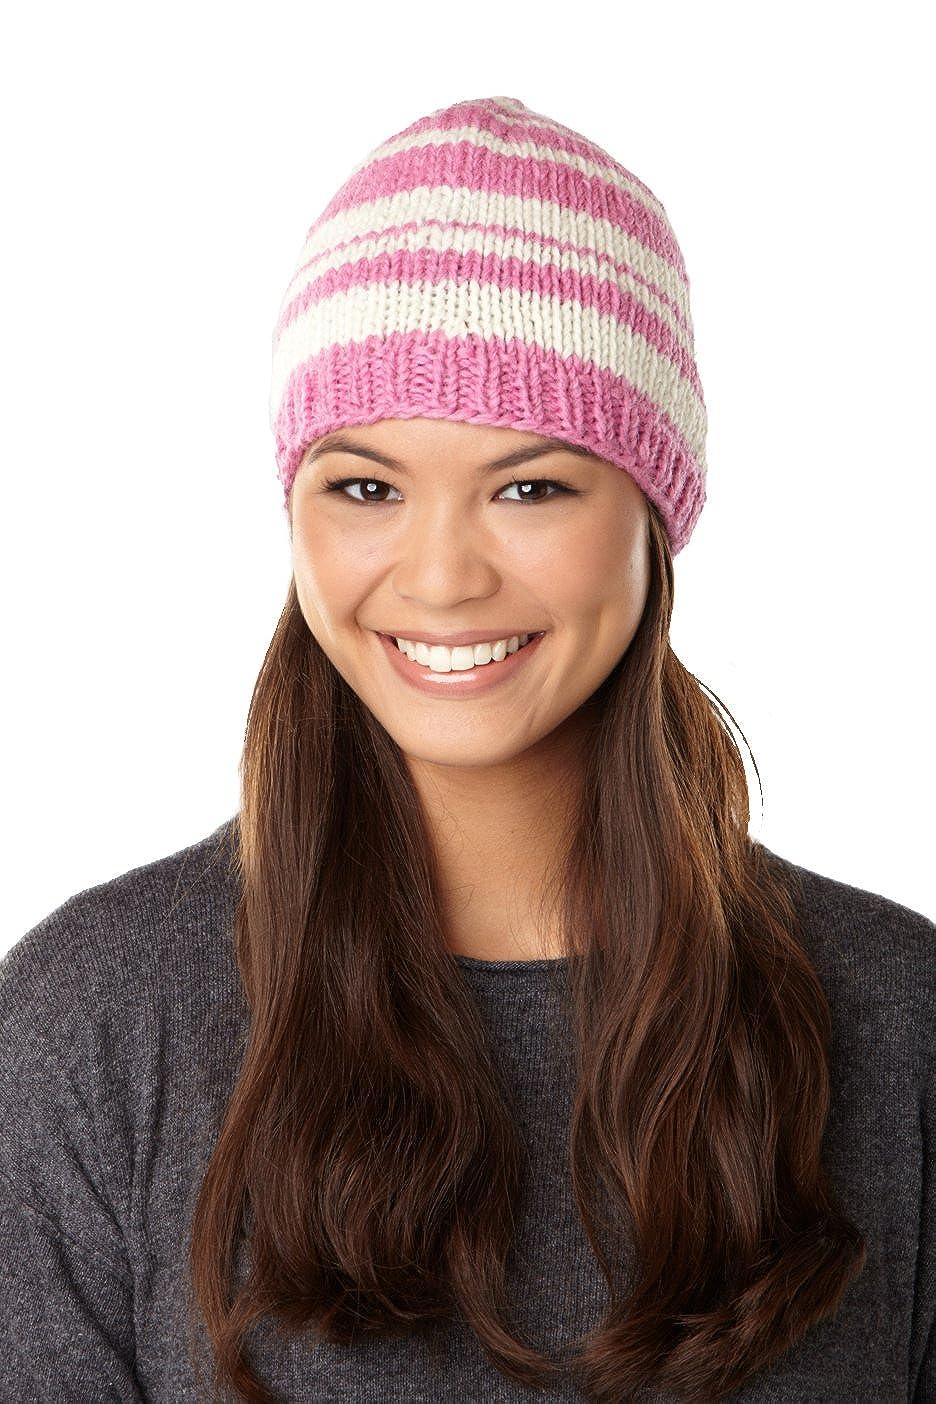 sijjl 'sストライプbeanie-pink、ホワイトstriped-oneサイズ   B0062OT6LW